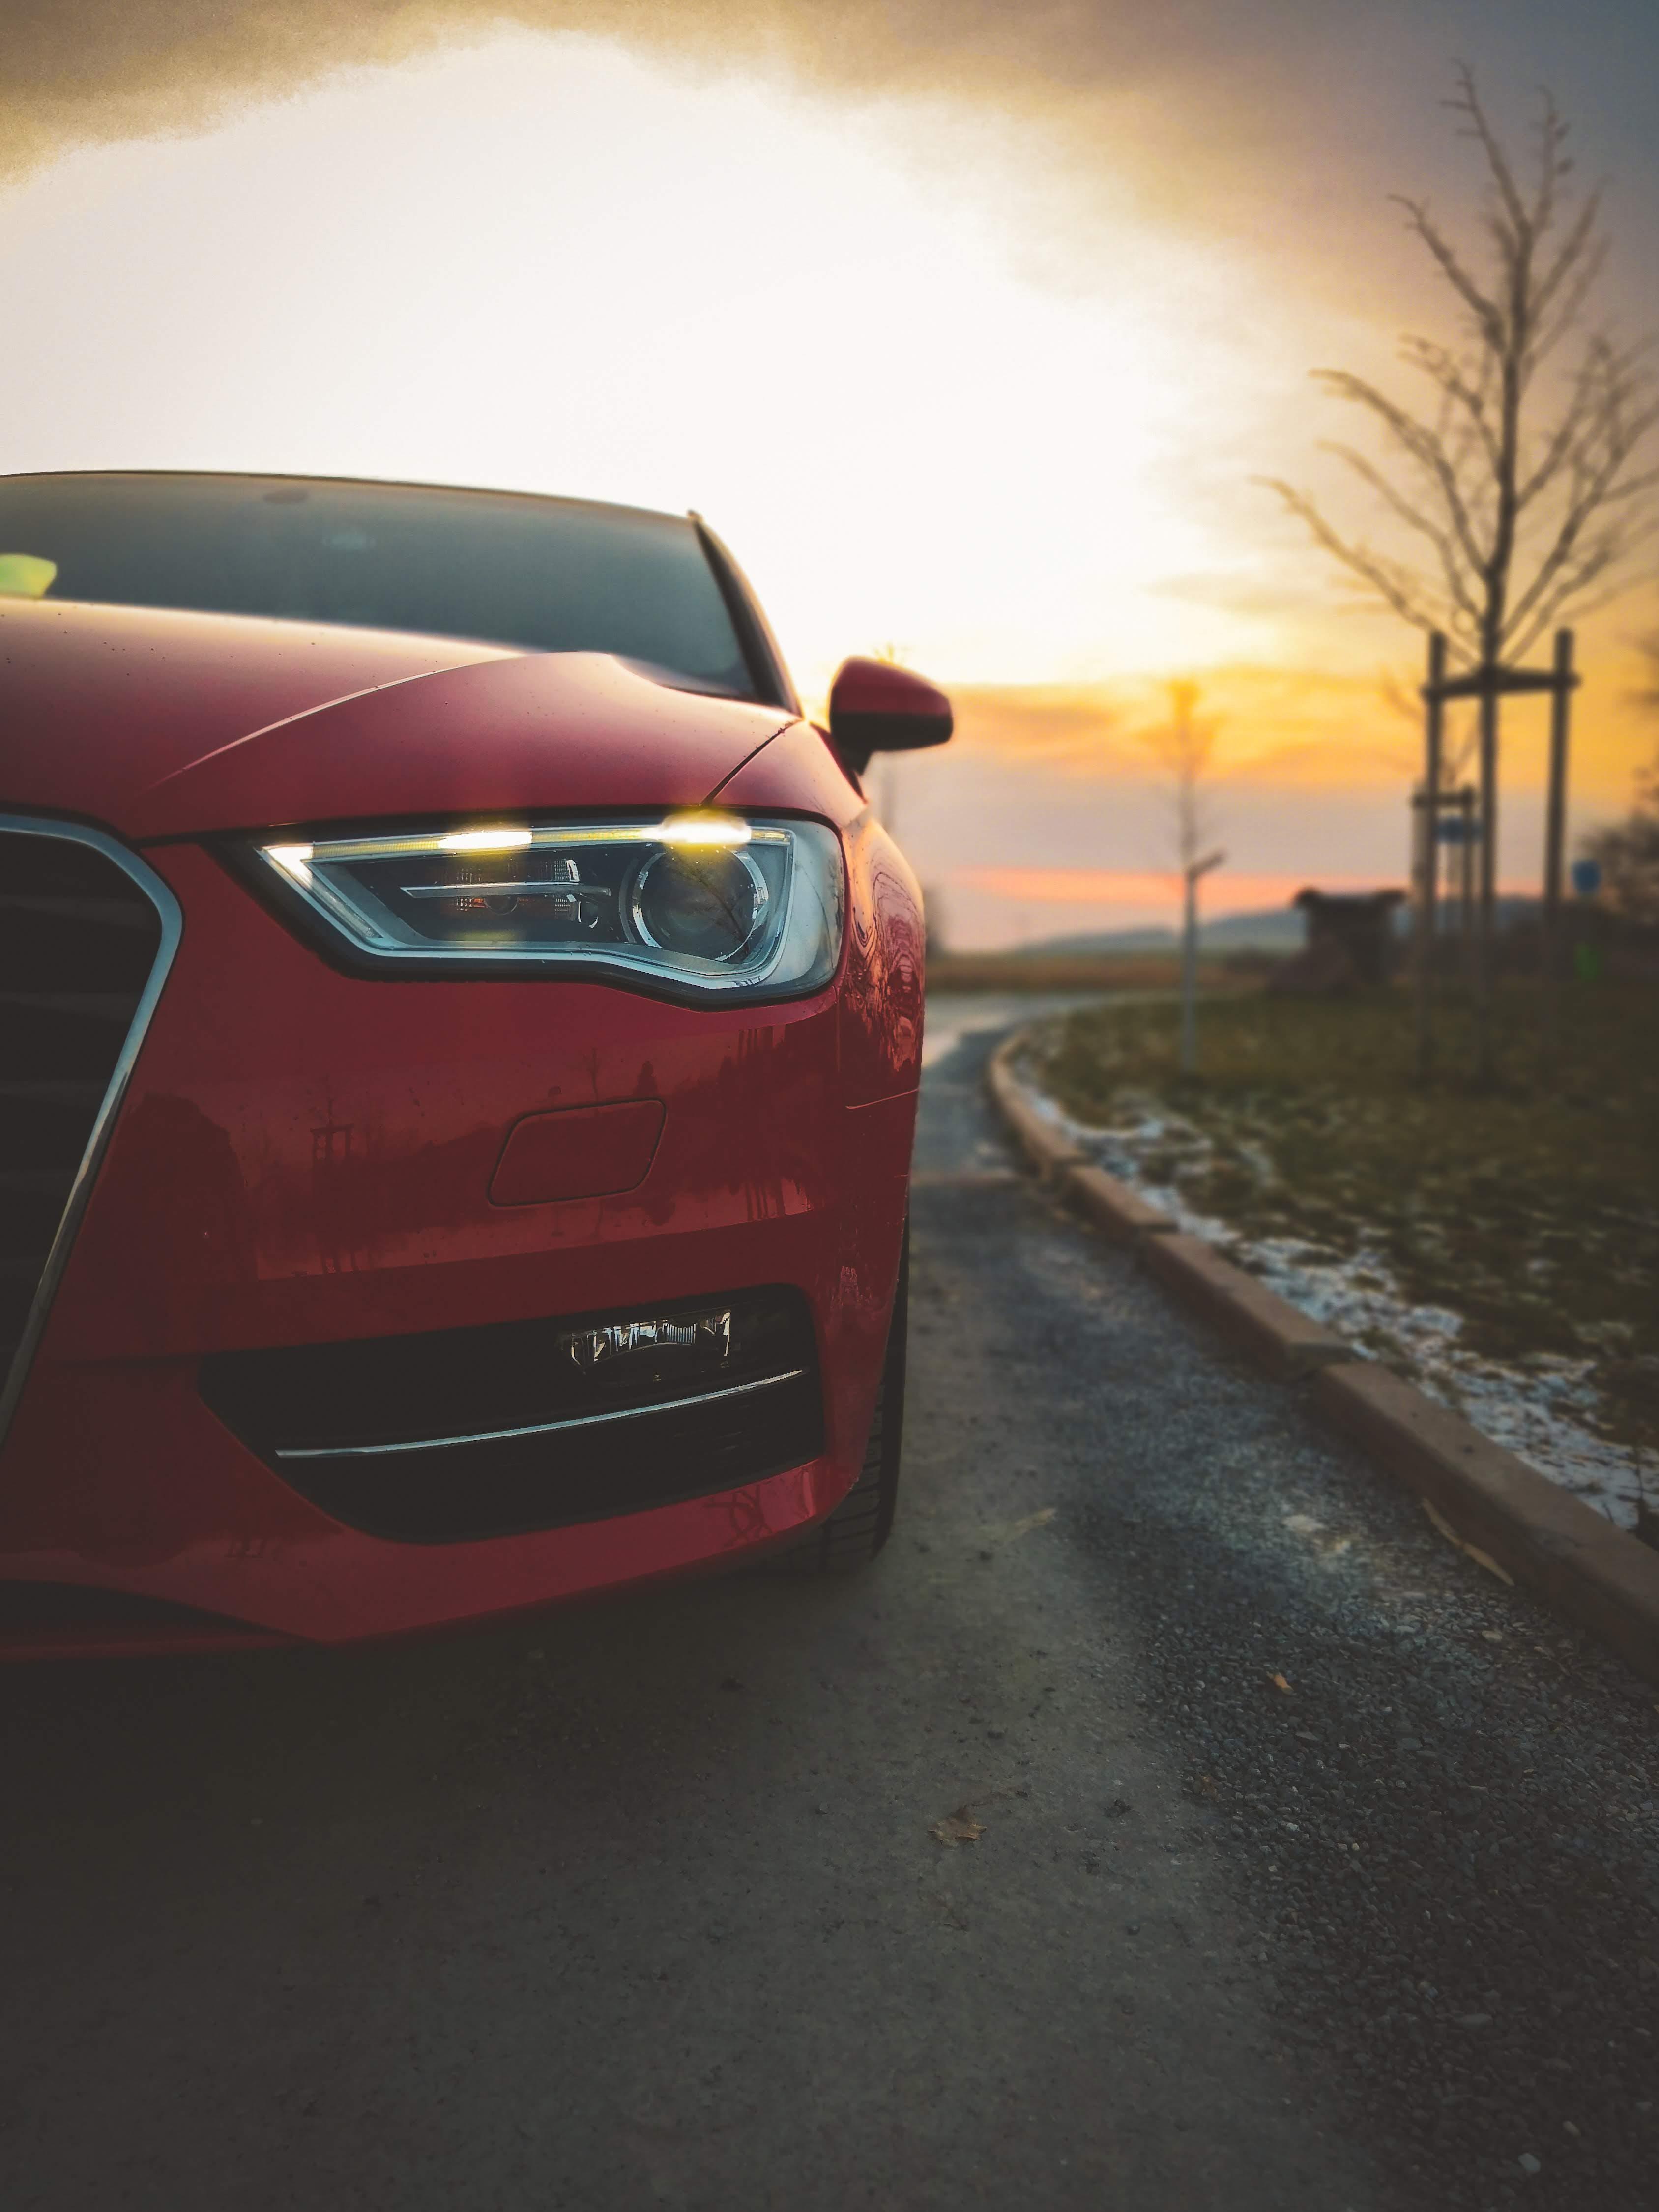 Free stock photo of audi, golden horizon, golden sun, luxury car